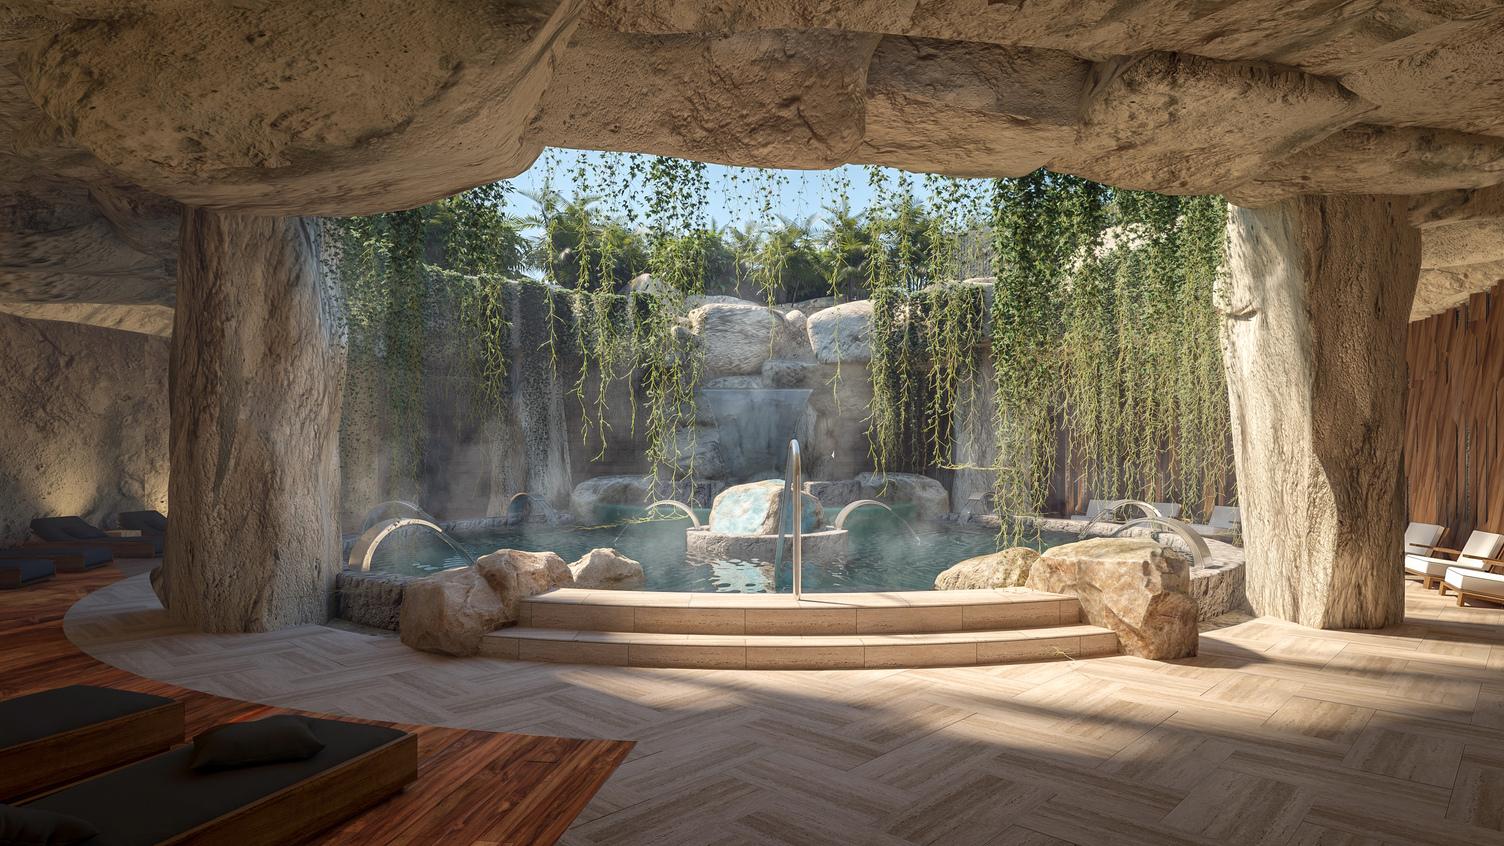 Hyatt Ziva/Zilara Hydrotherapy Spa